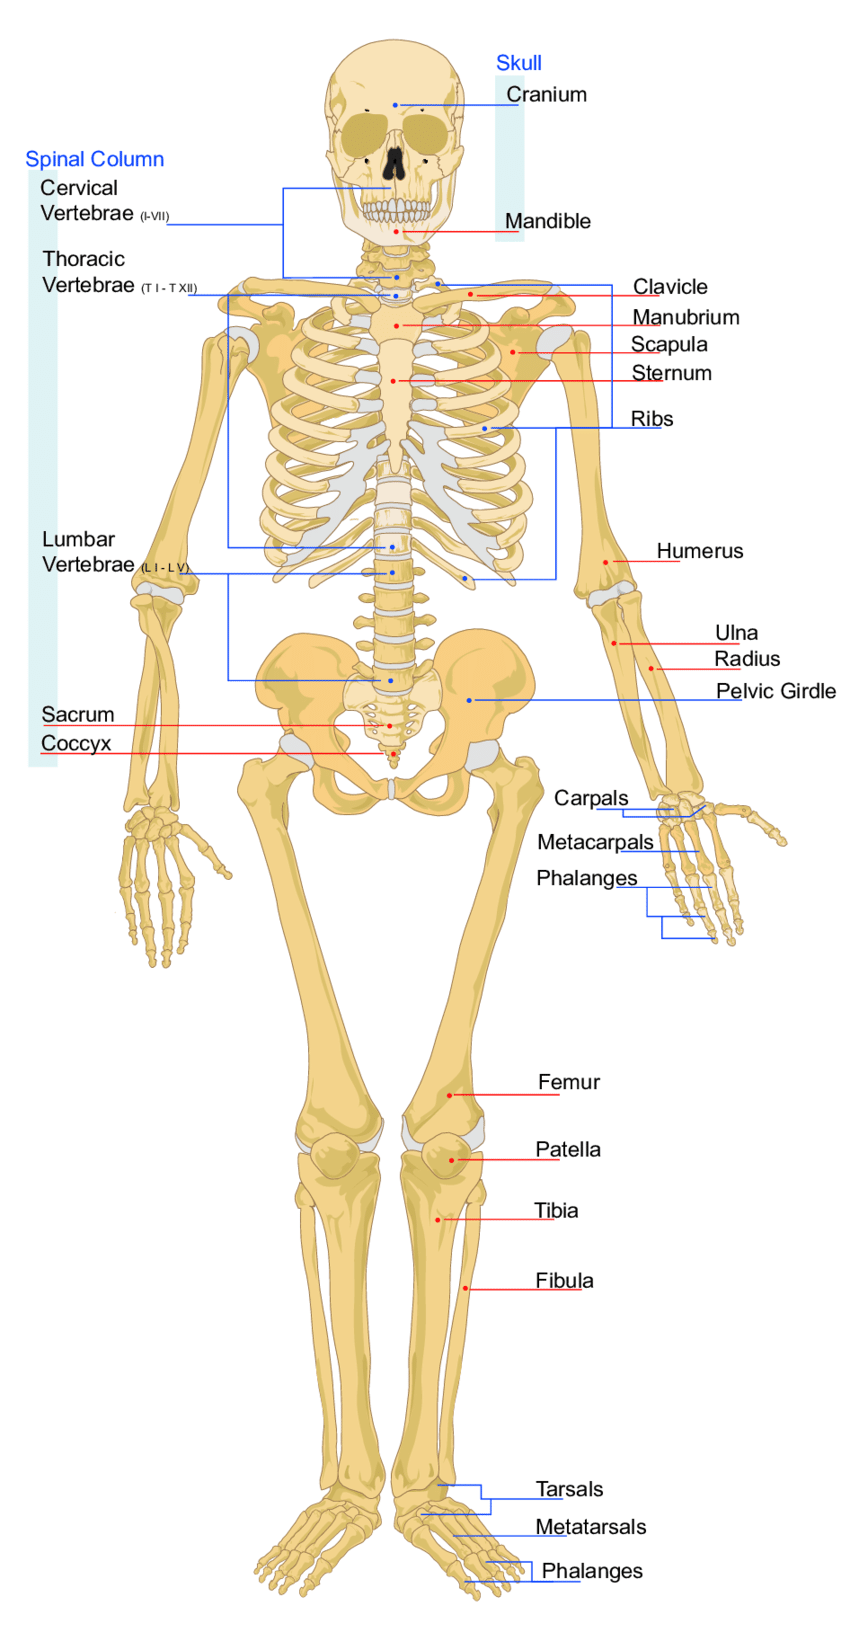 medium resolution of figure a 3 diagram of major human body bones source wikimedia commons